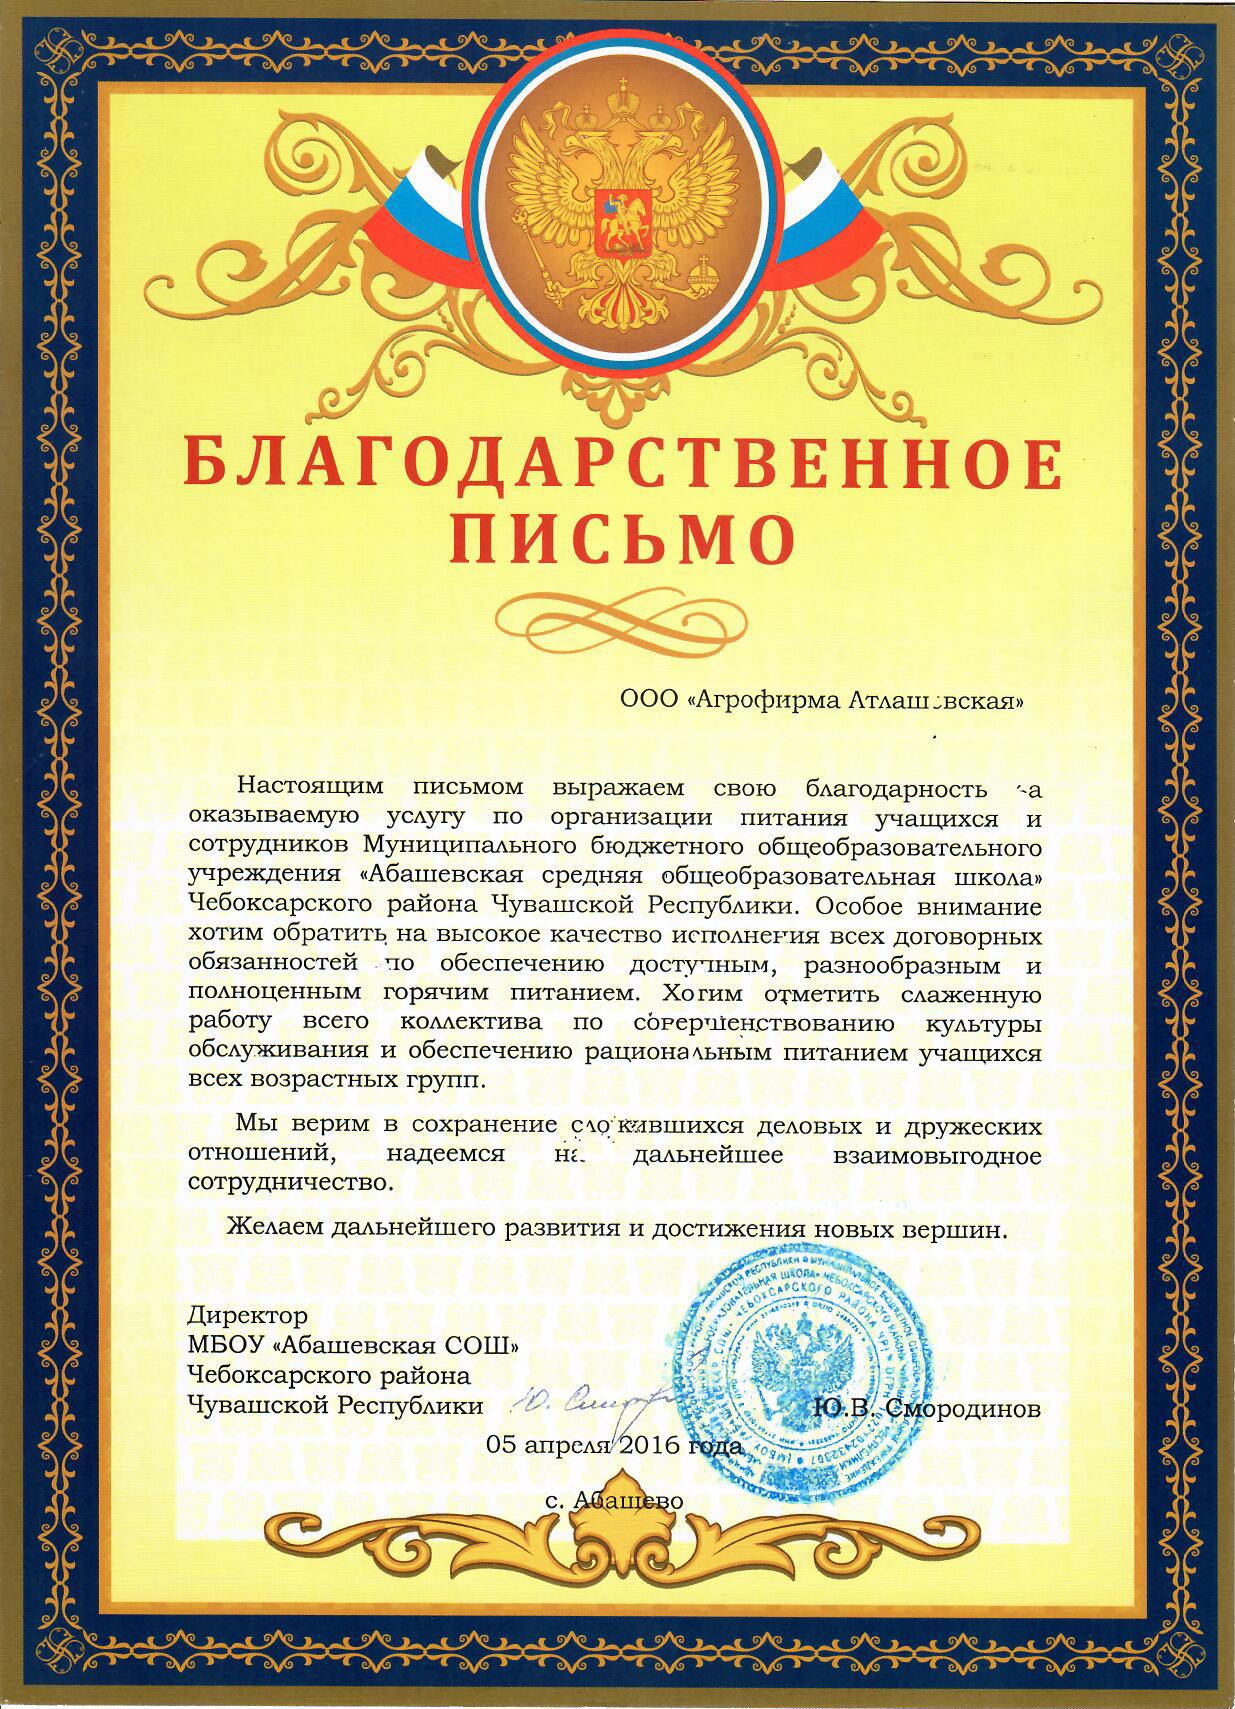 https://static-sl.insales.ru/files/1/6046/4904862/original/Abashevo.jpg